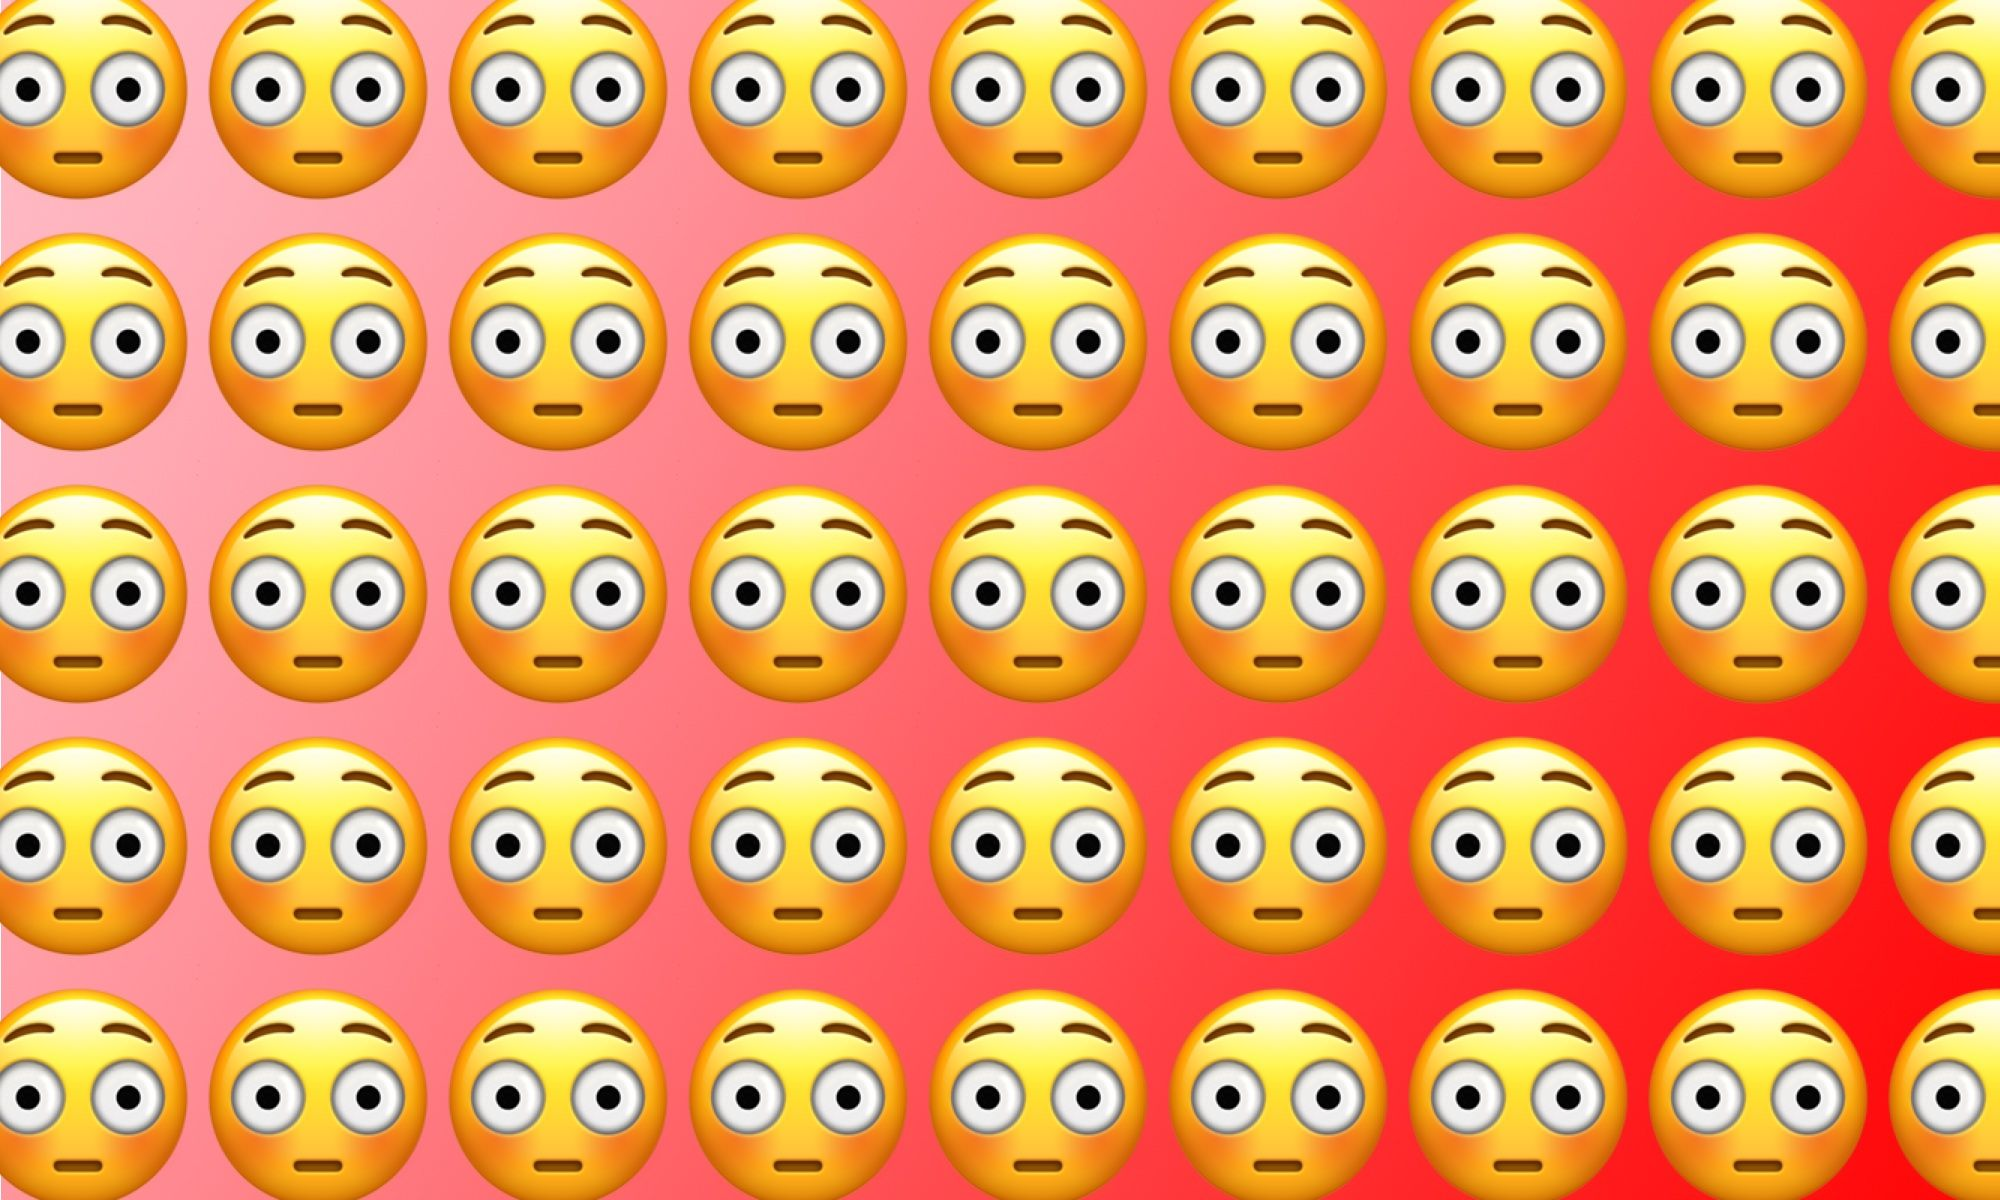 Emojiology: 😳 Flushed Face